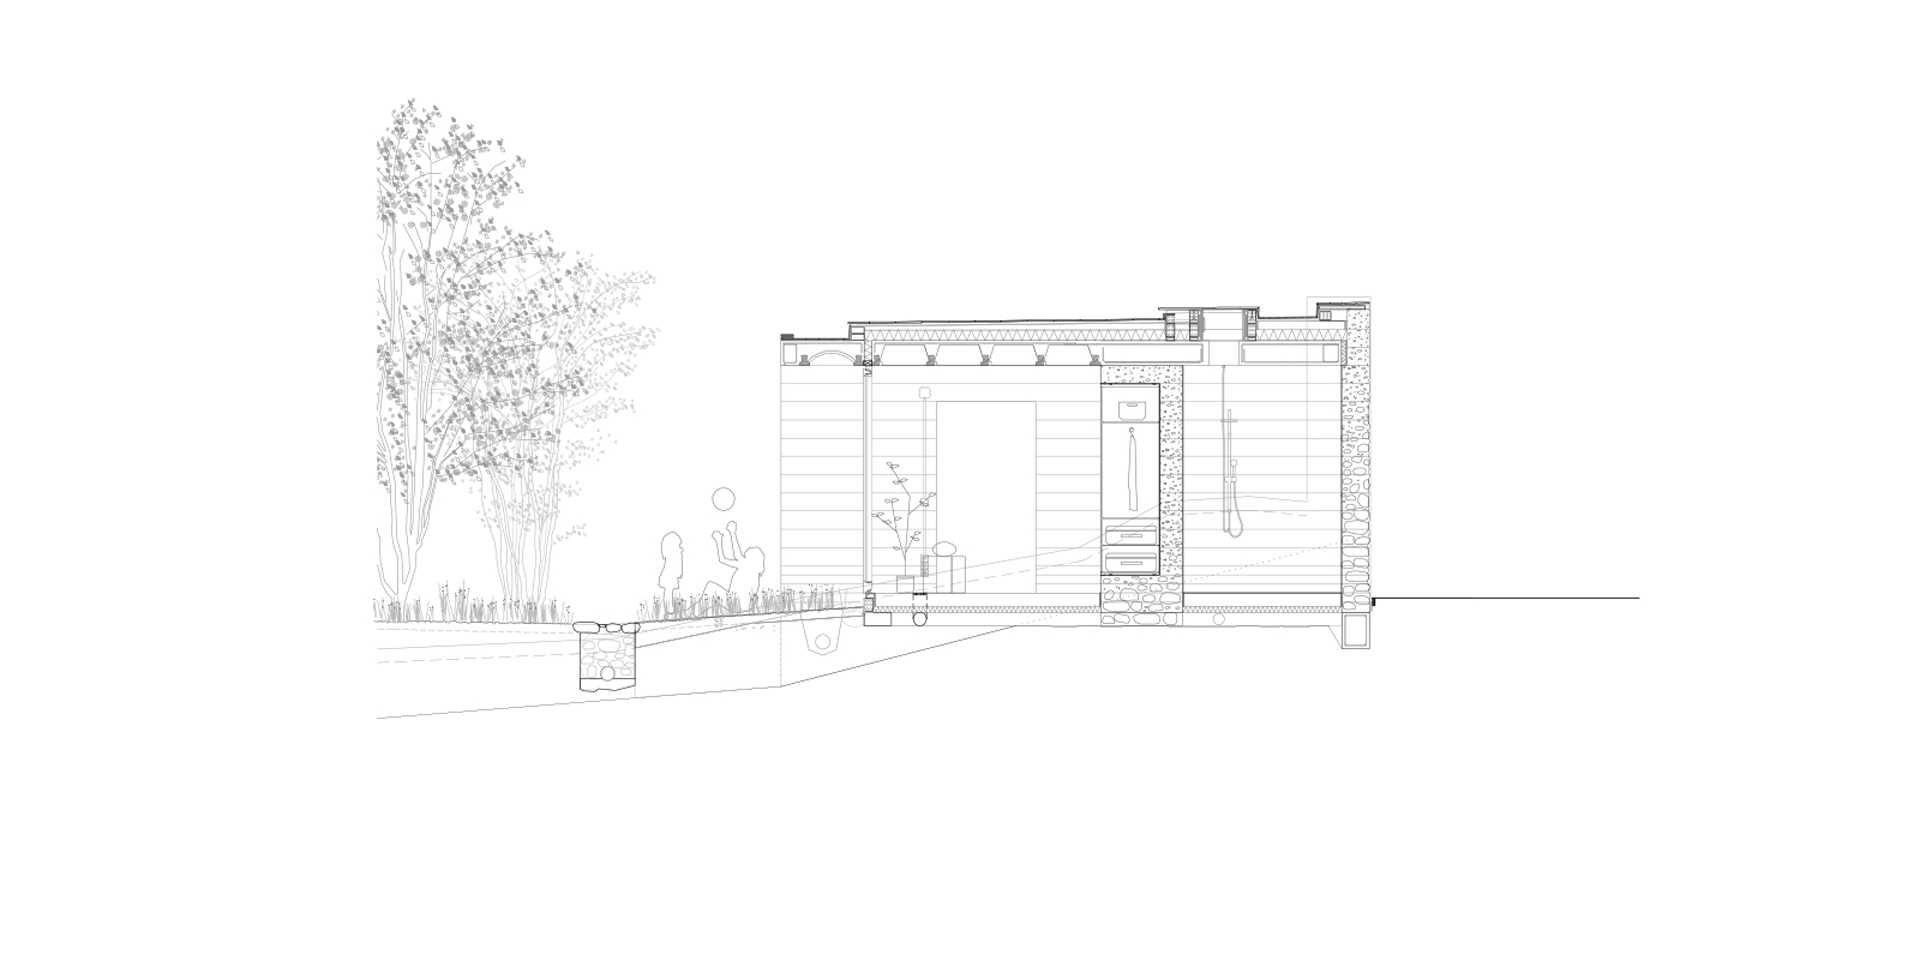 House 1413  - p3.1.3 53